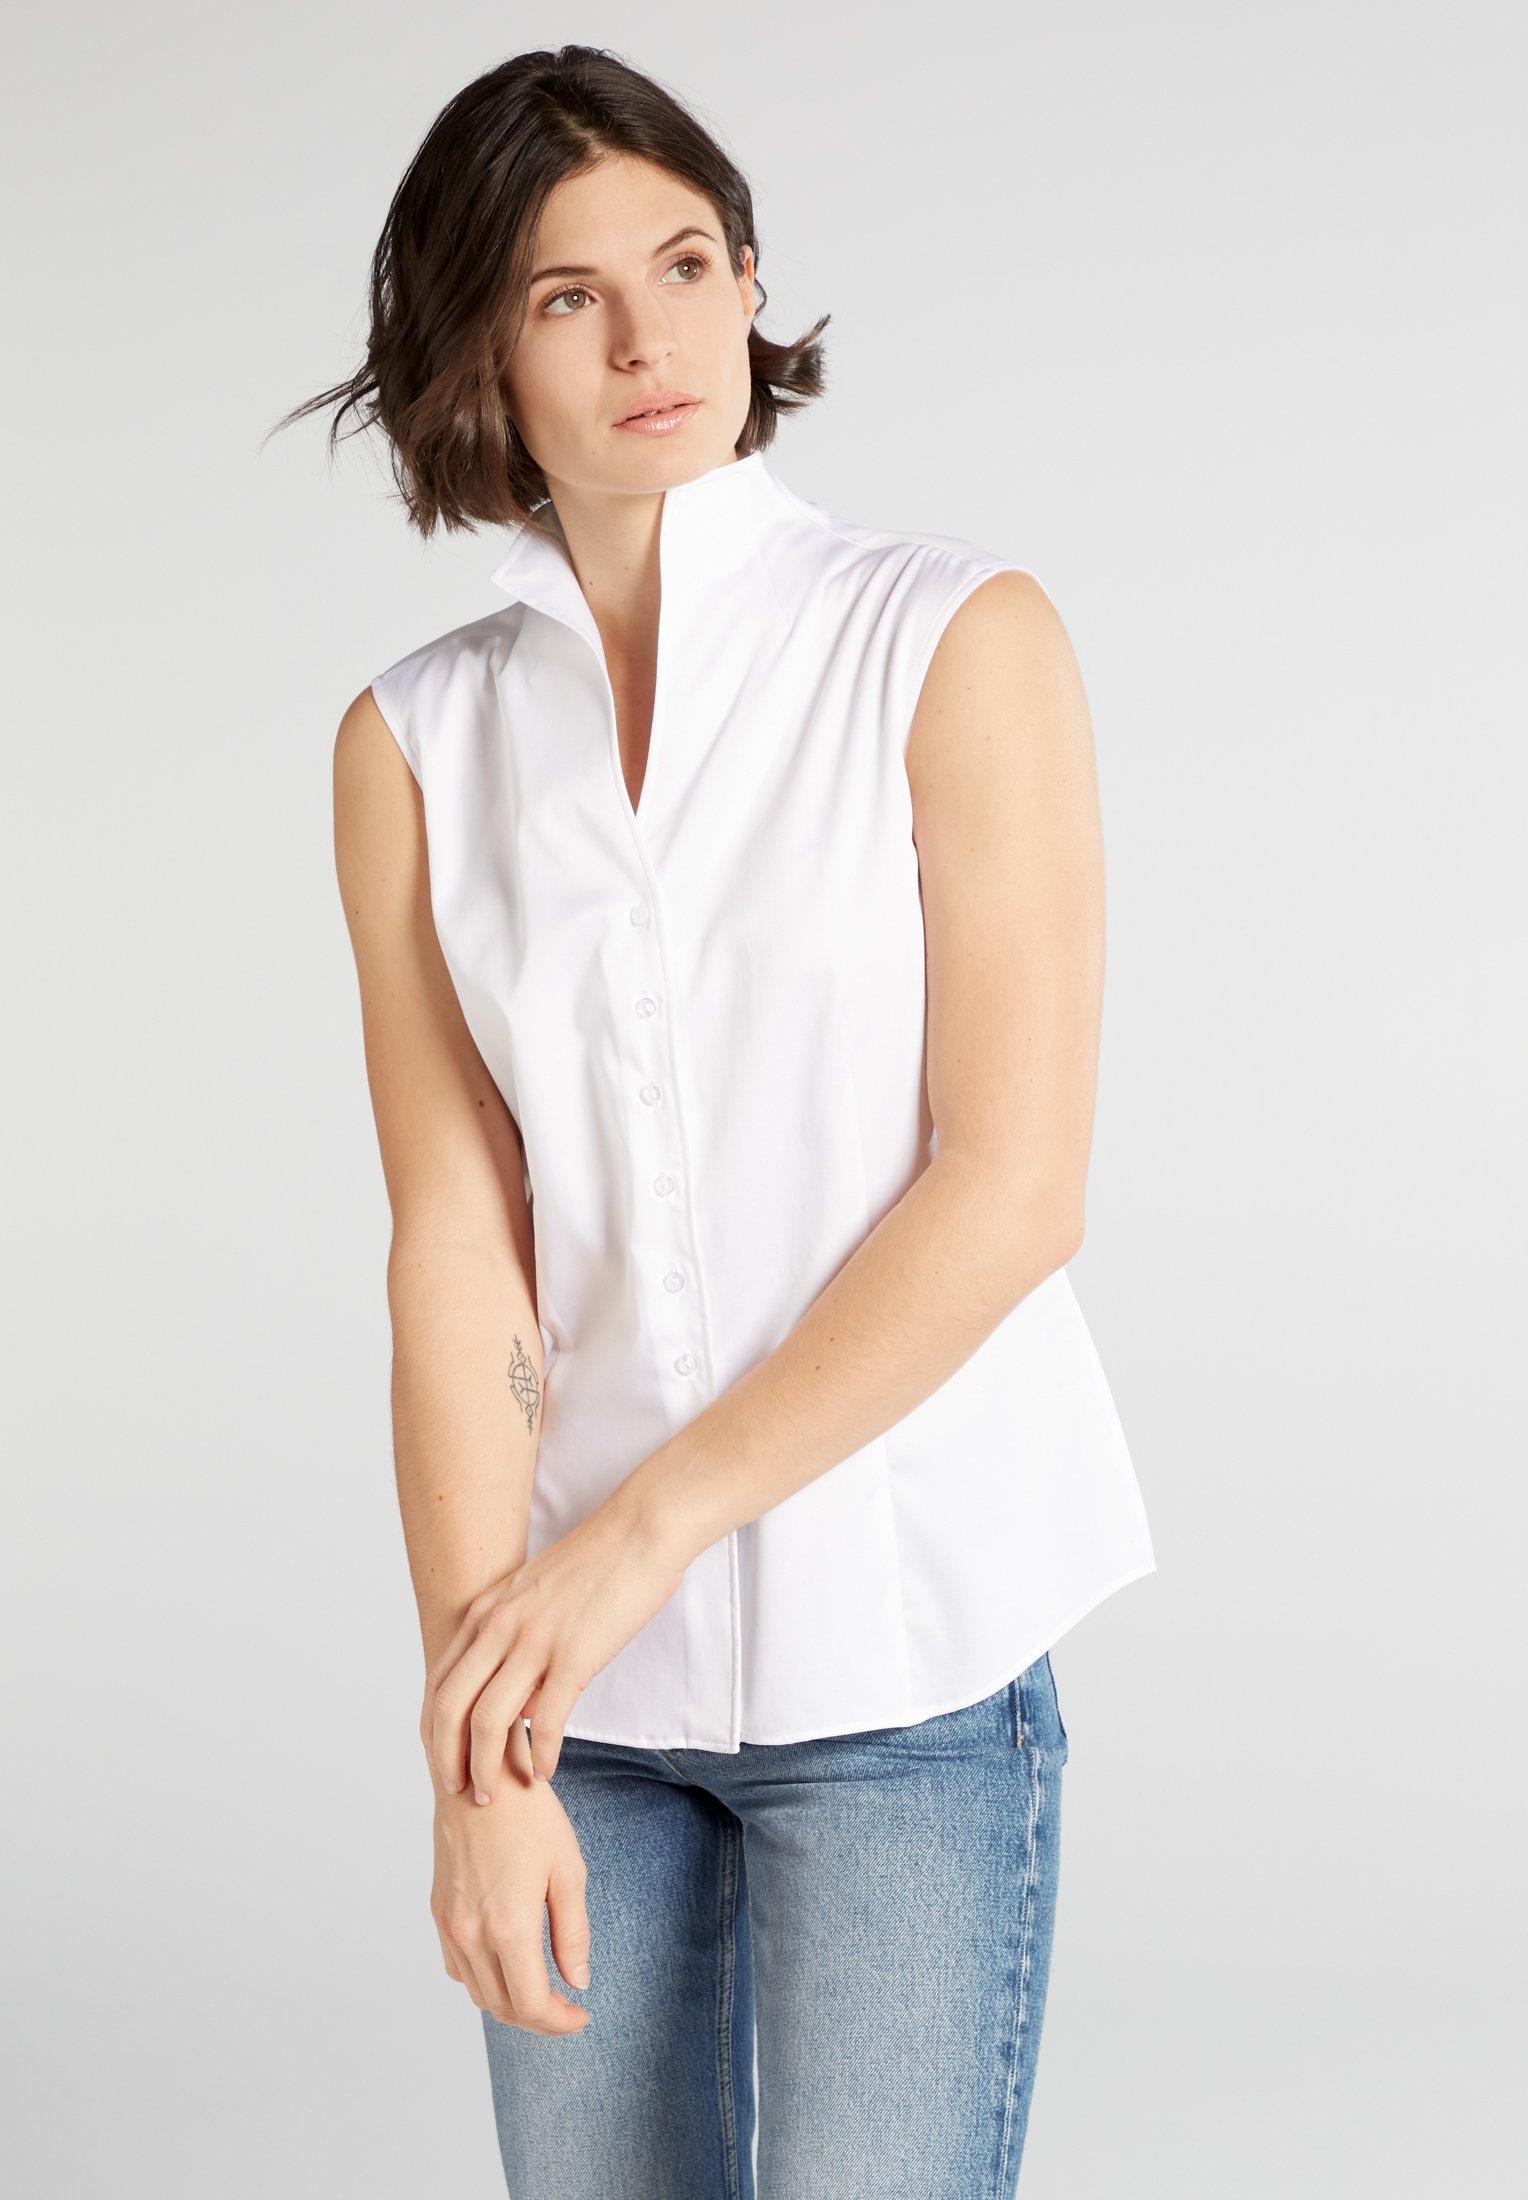 Eterna satijnen blouse MODERN CLASSIC mouwloze blouse online kopen op otto.nl